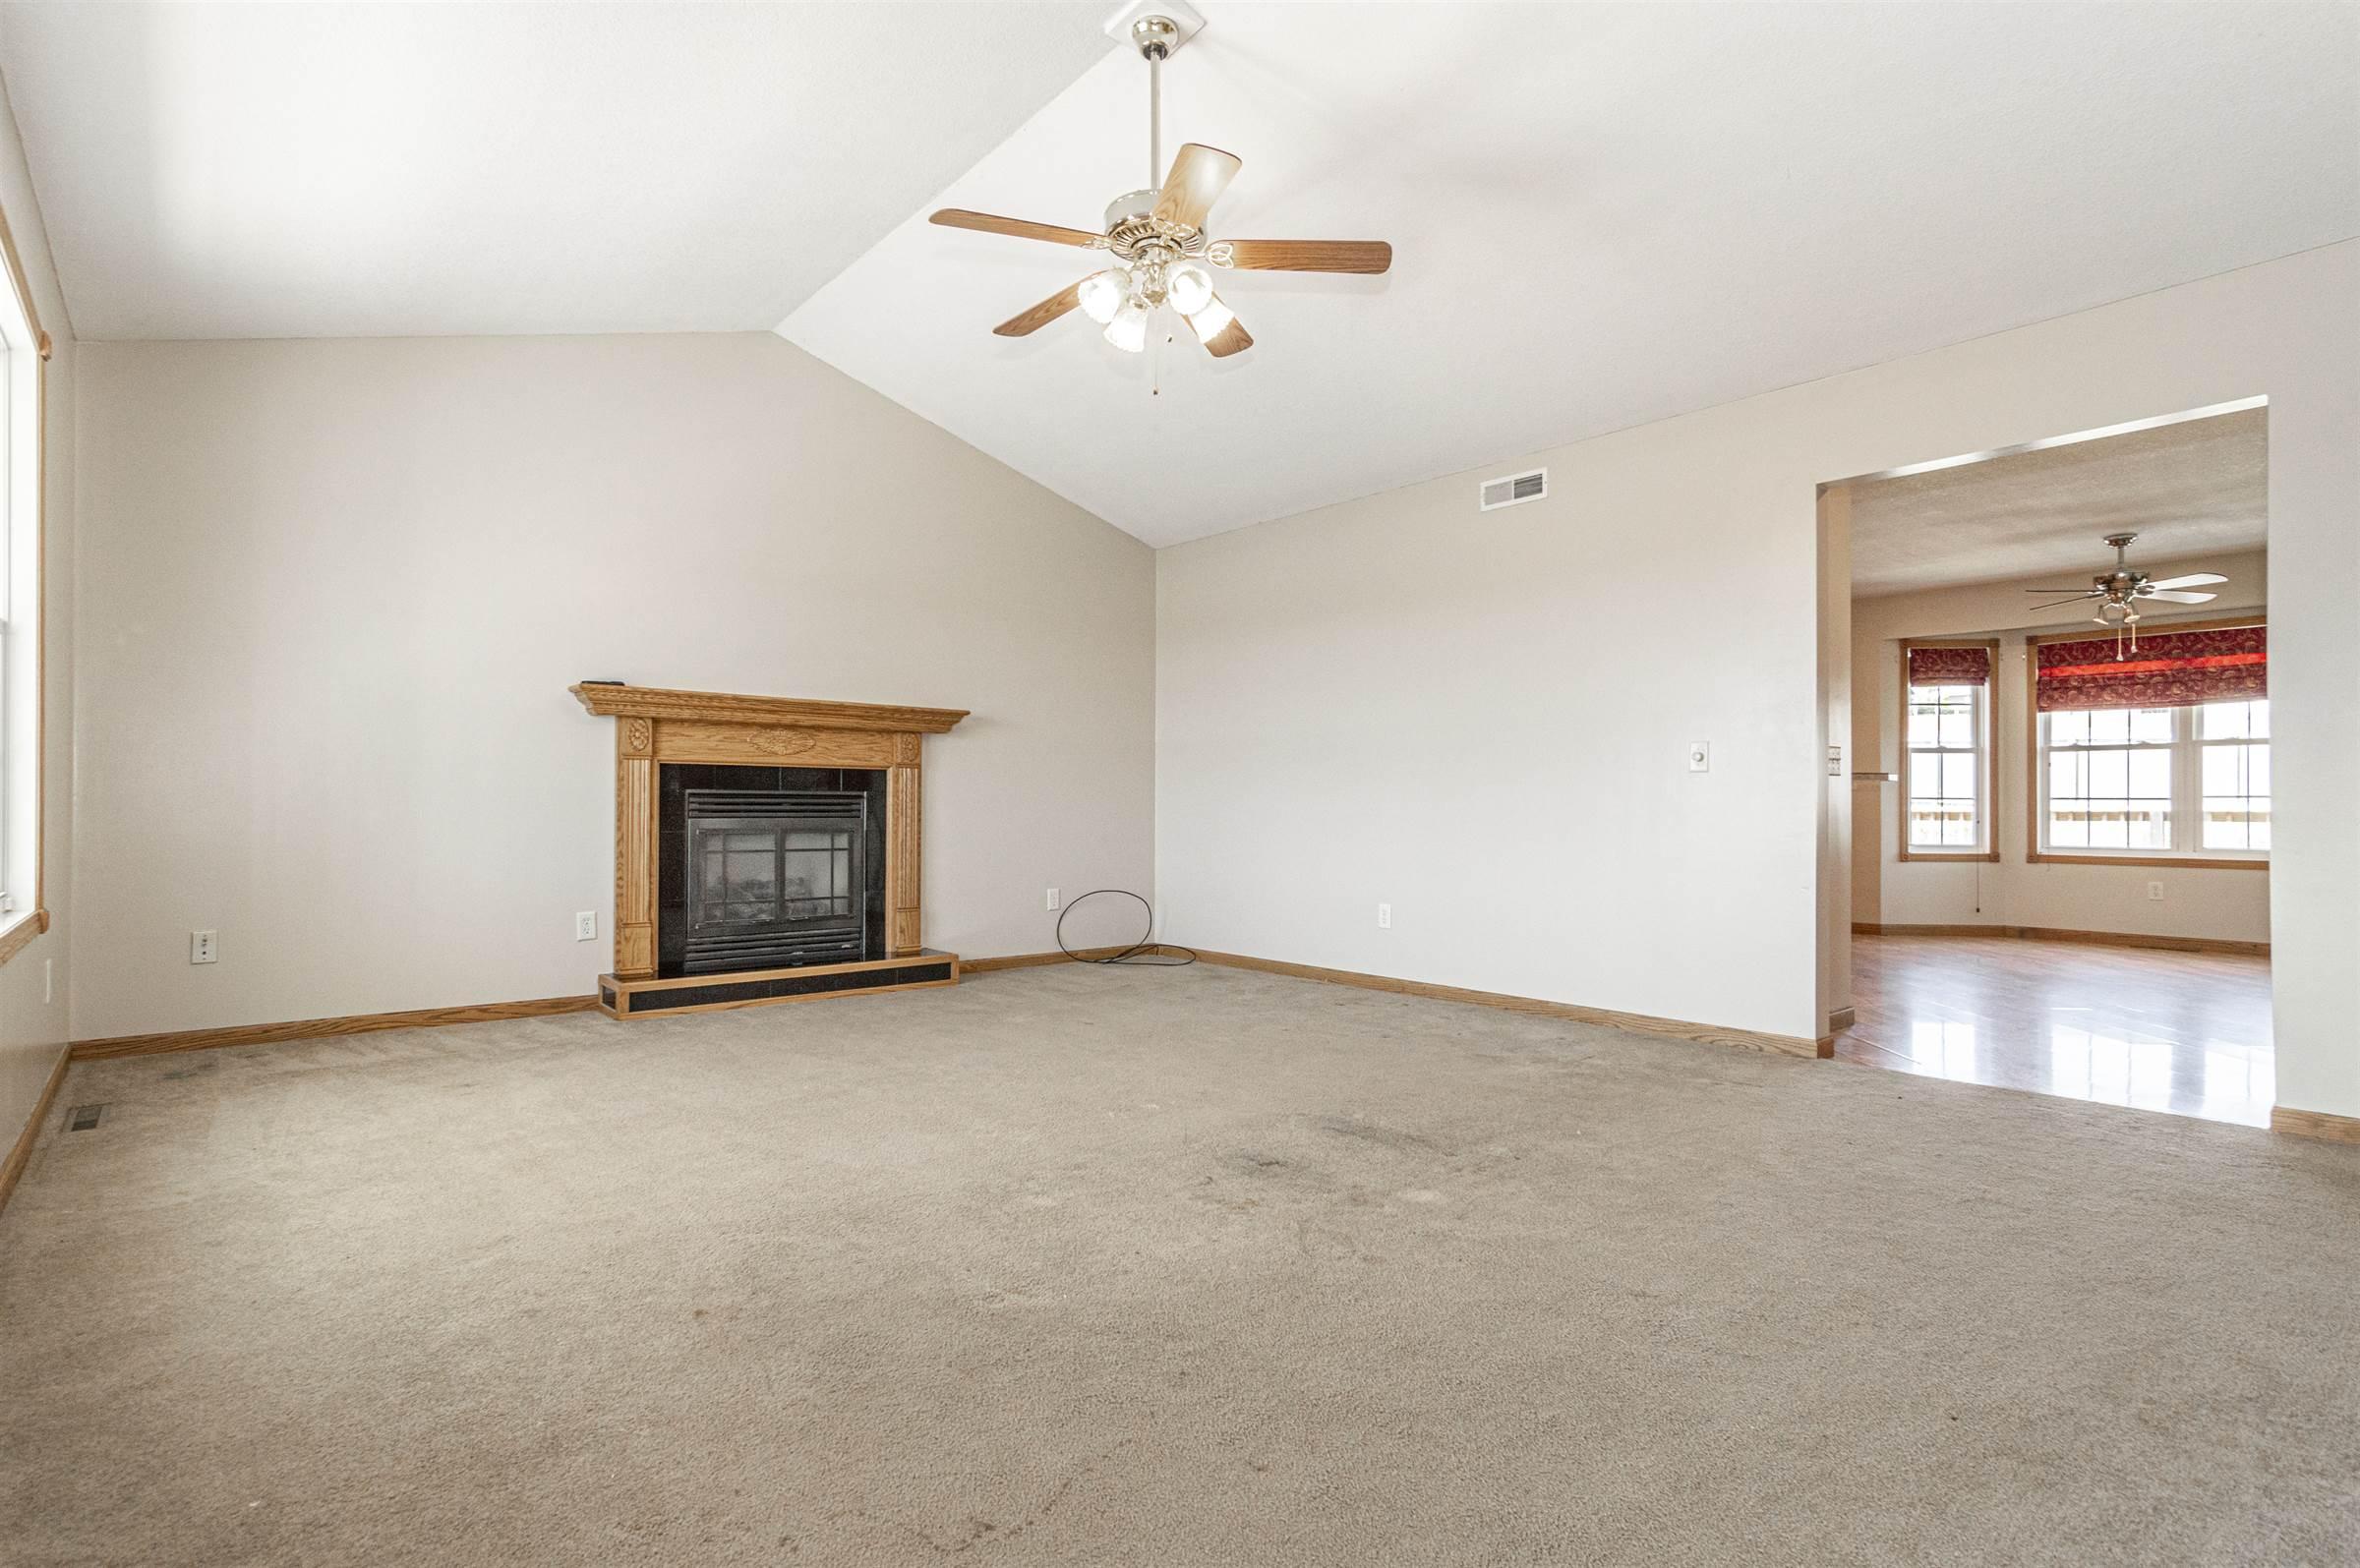 1125 Manor Drive, Chapman, KS 67431